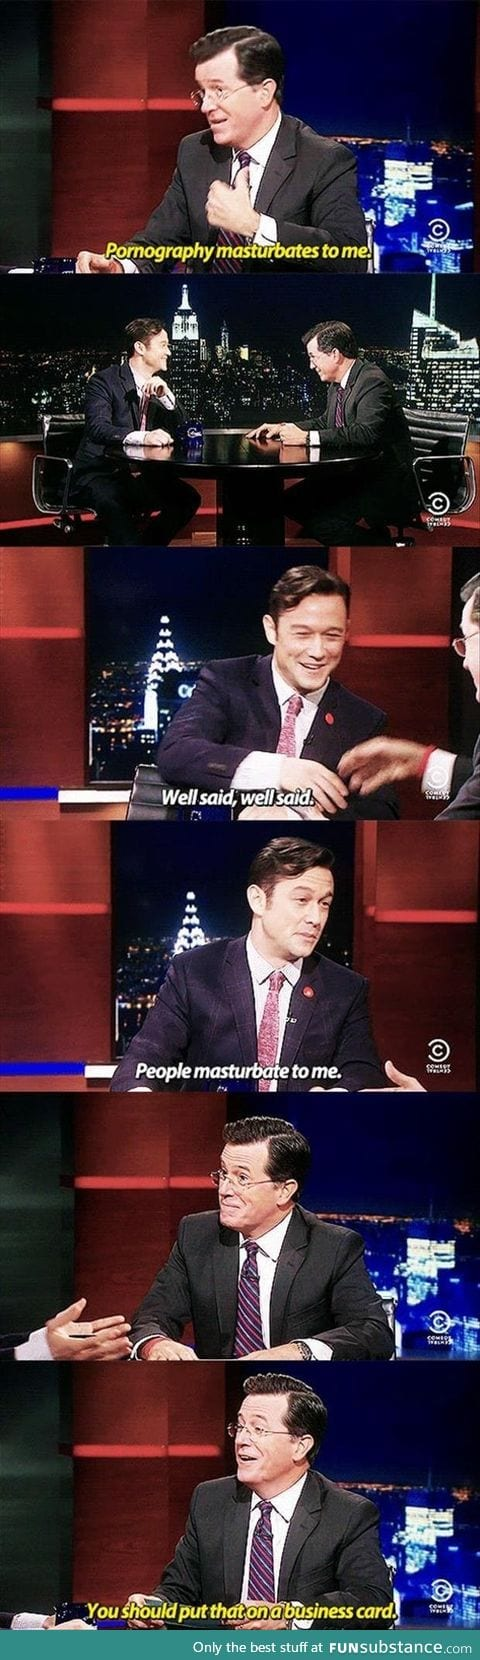 Oh Gordon